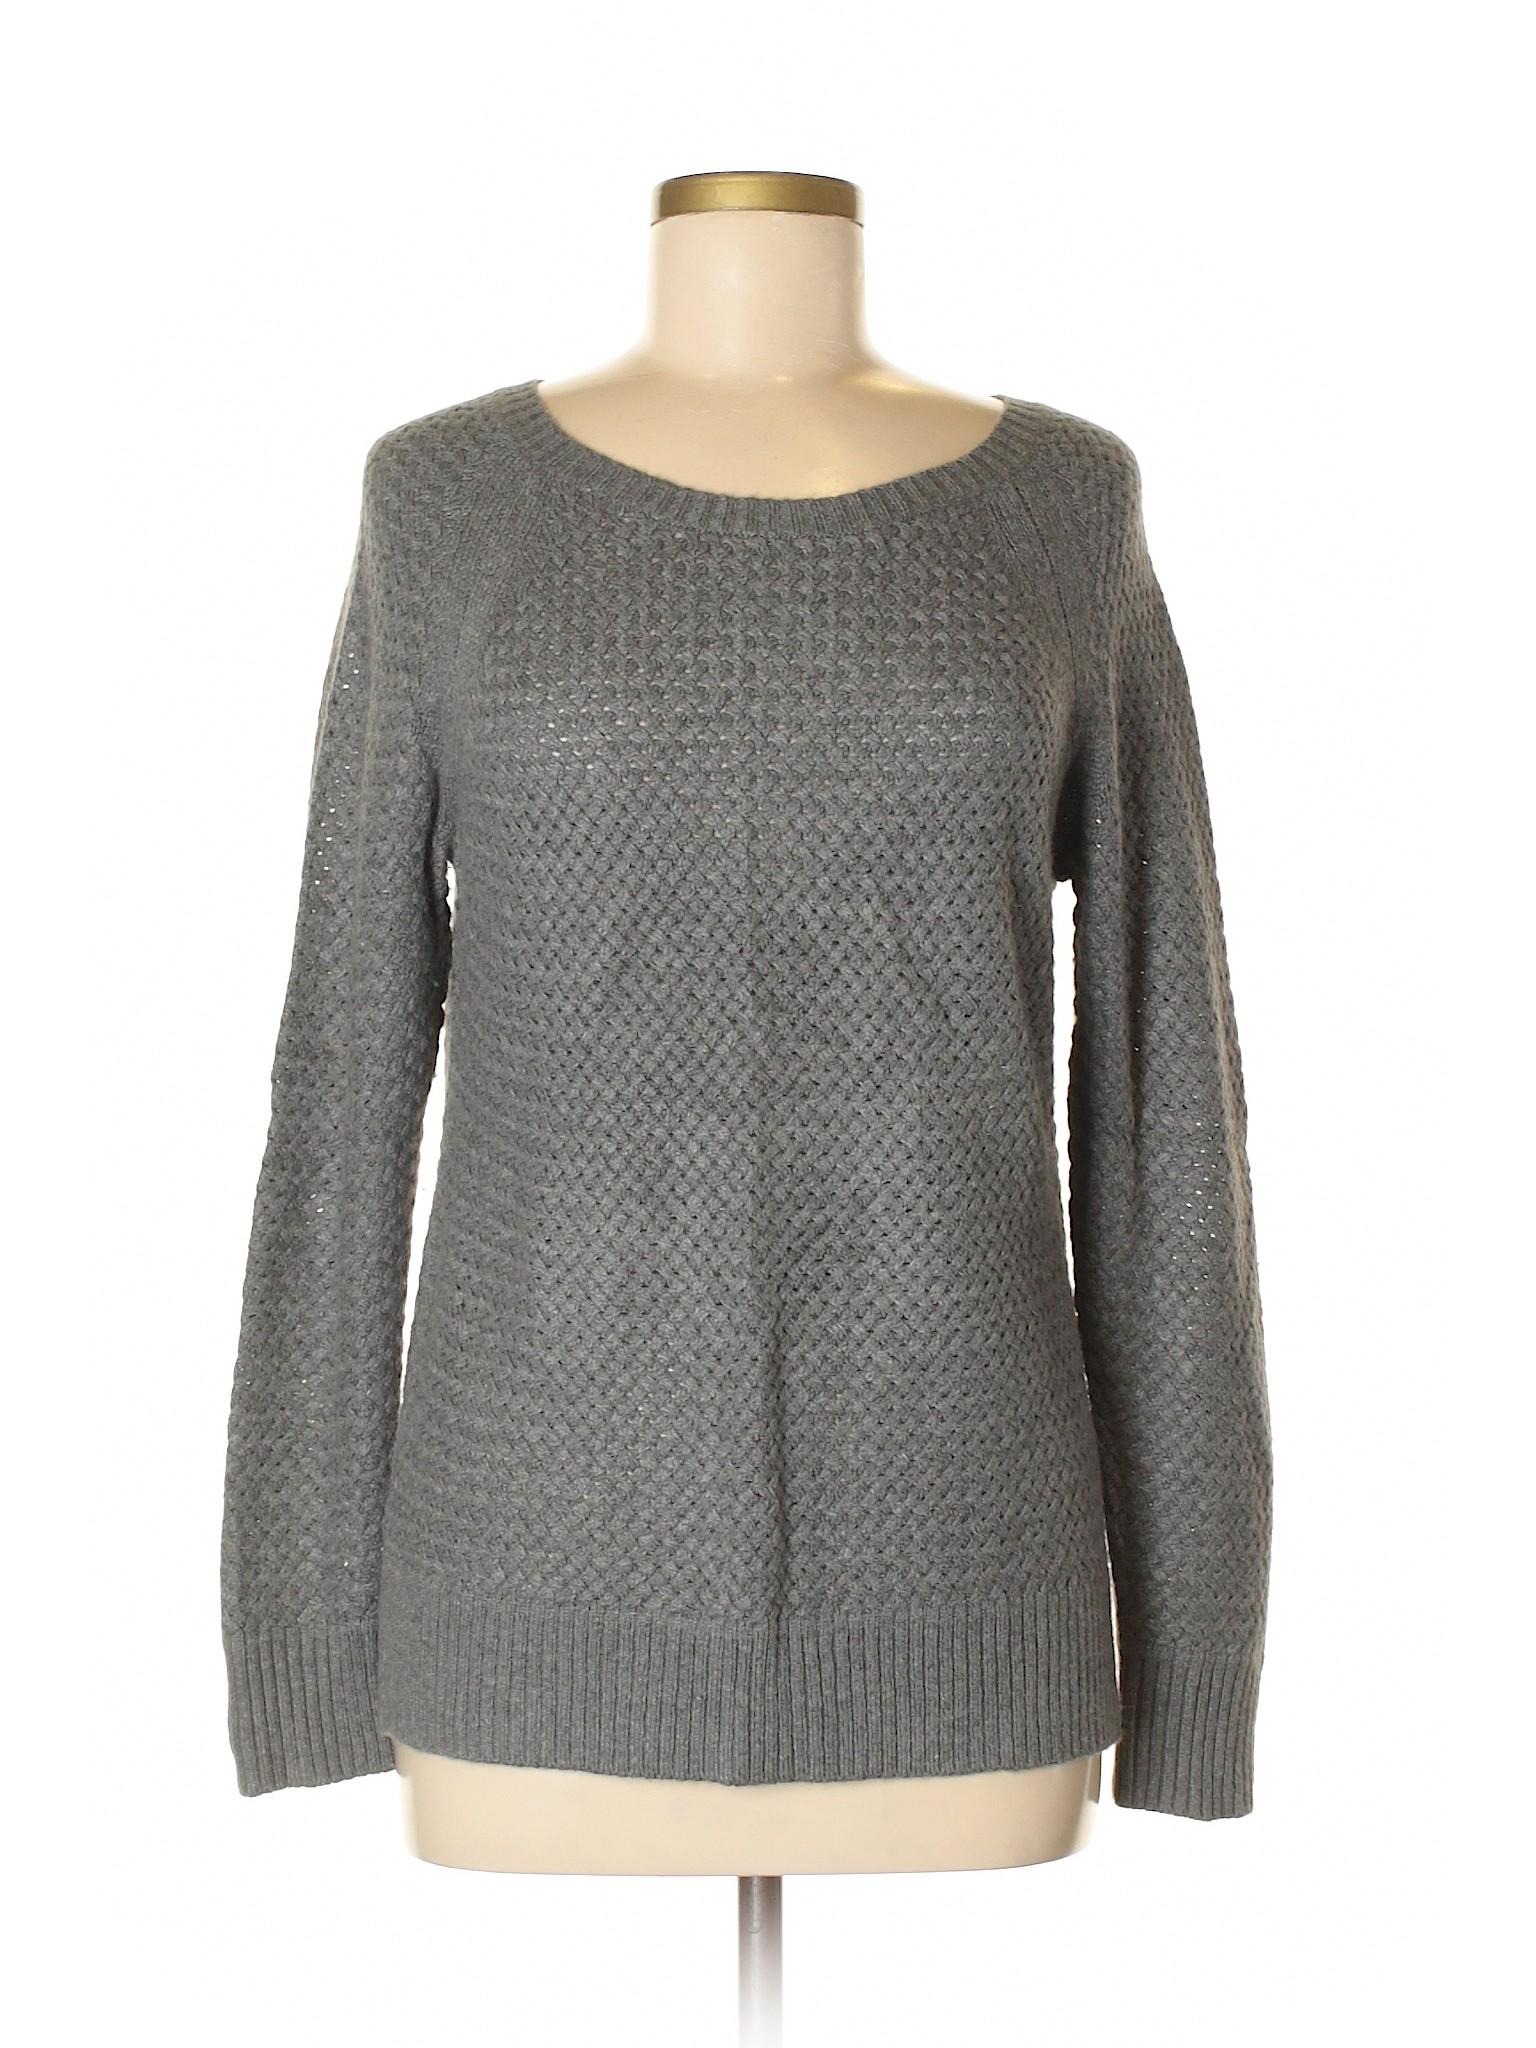 Banana Pullover winter Sweater Republic Boutique P4tq5nFwT